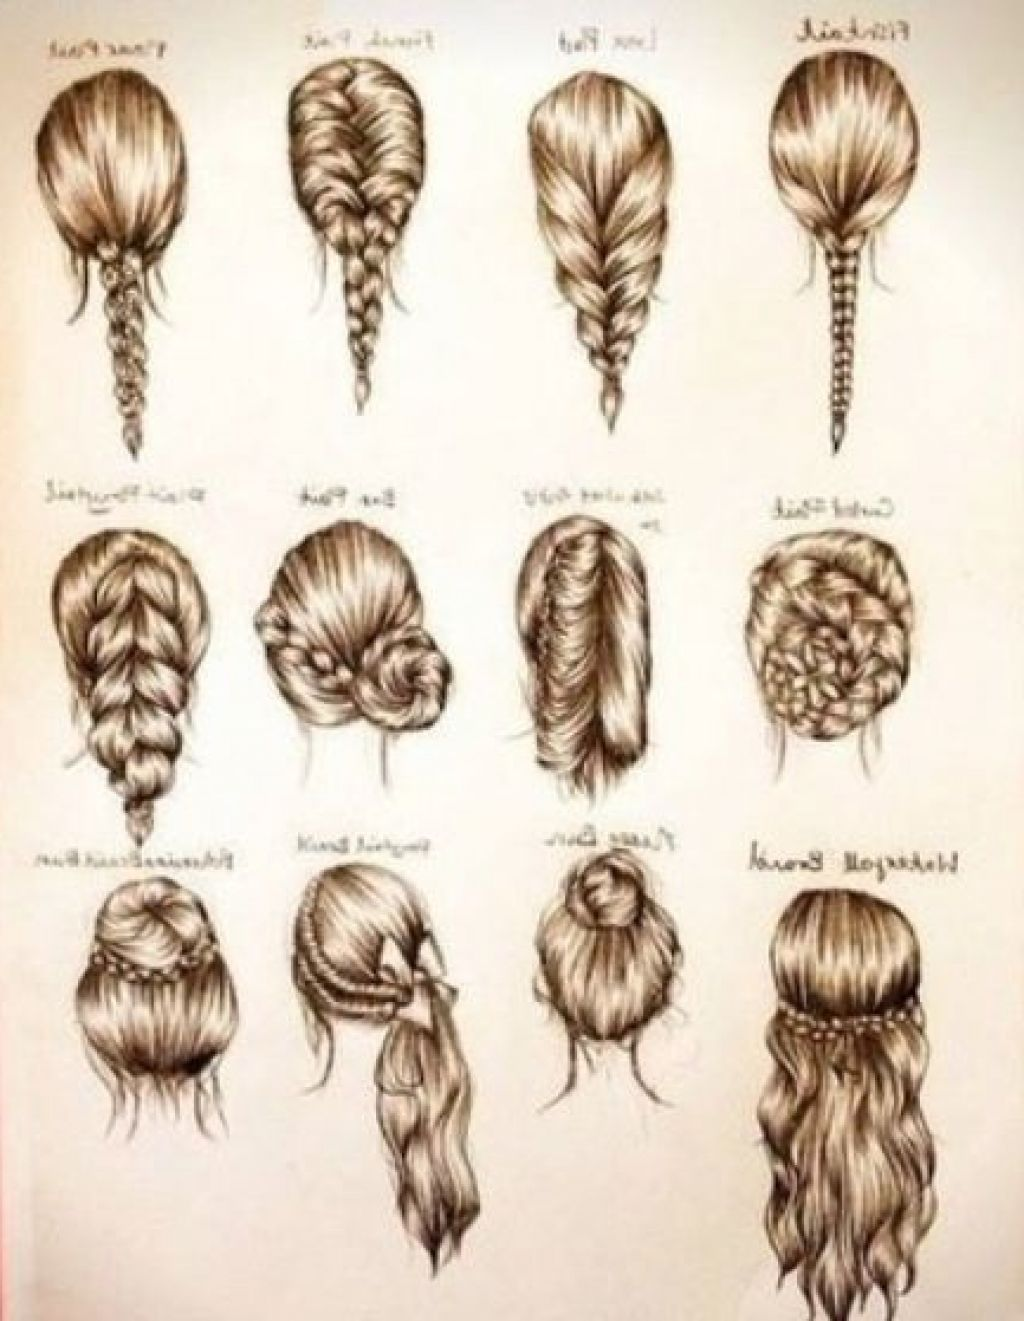 Easy Braids For Medium Hair Easy Braids For Medium Hair Hairstyle For Women Man Braided Hairstyles Easy Medium Hair Styles Long Hair Styles